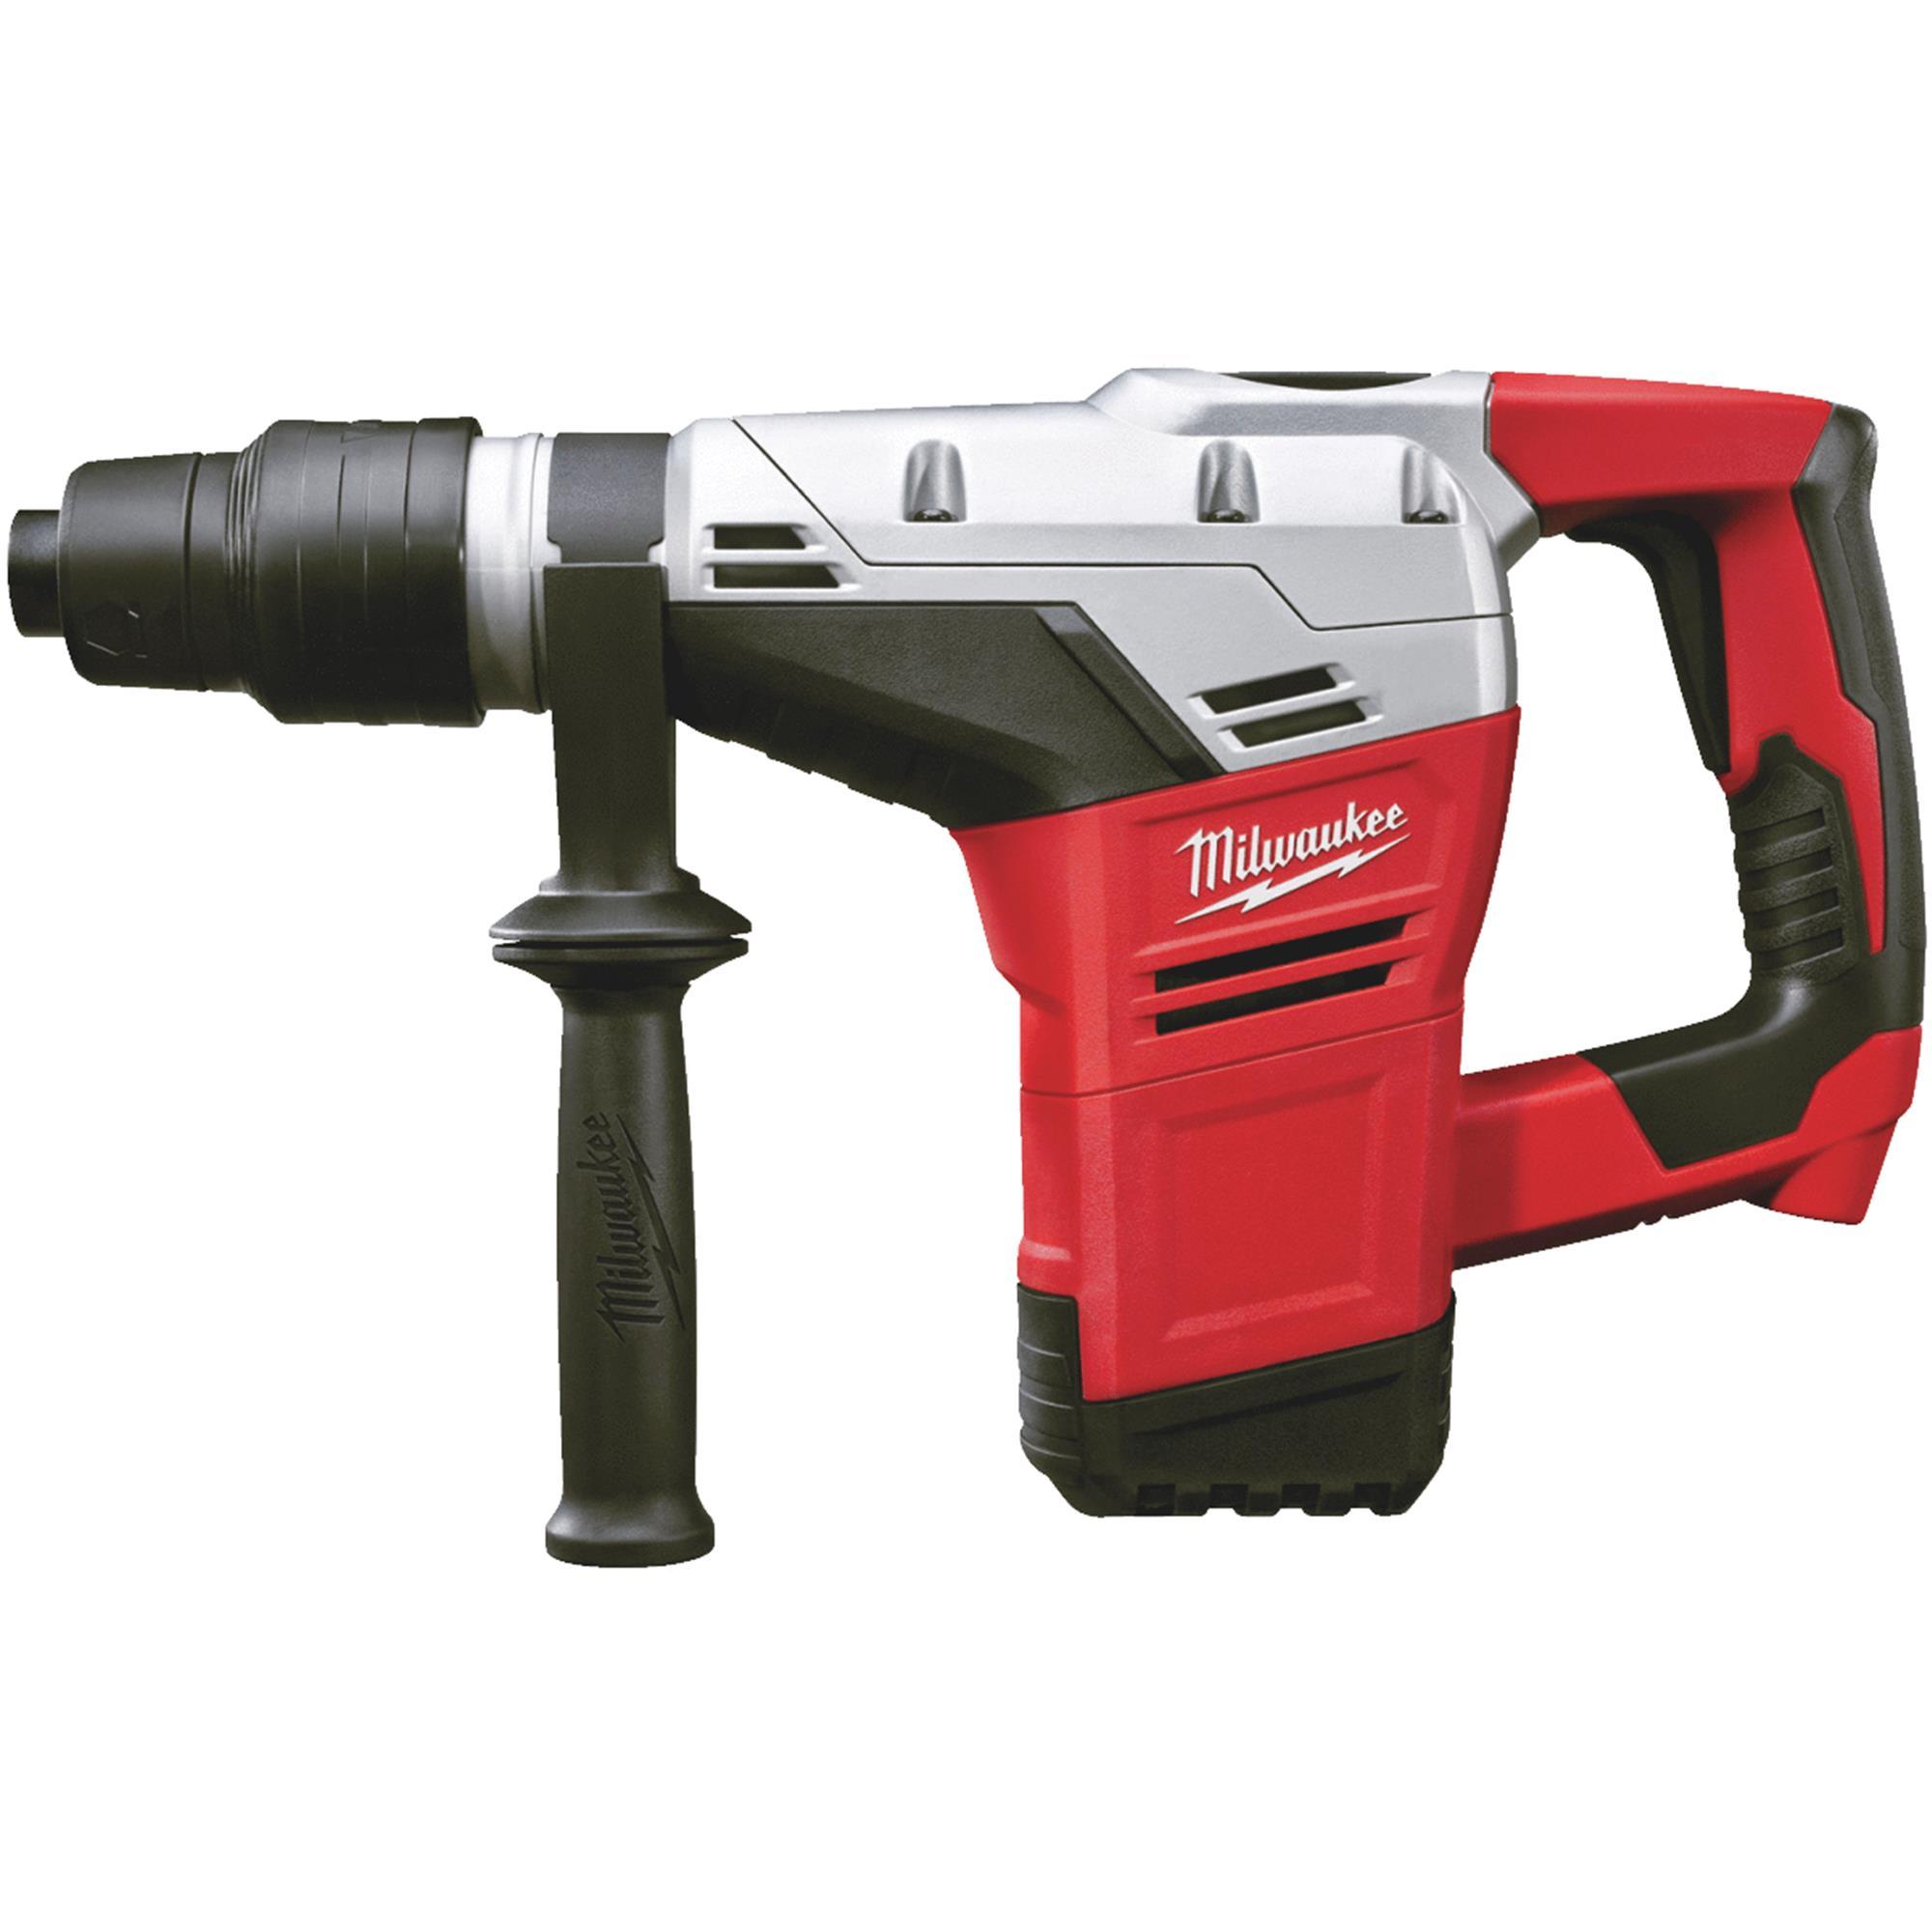 Milwaukee 1-9/16 In. Spline Electric Hammer Drill